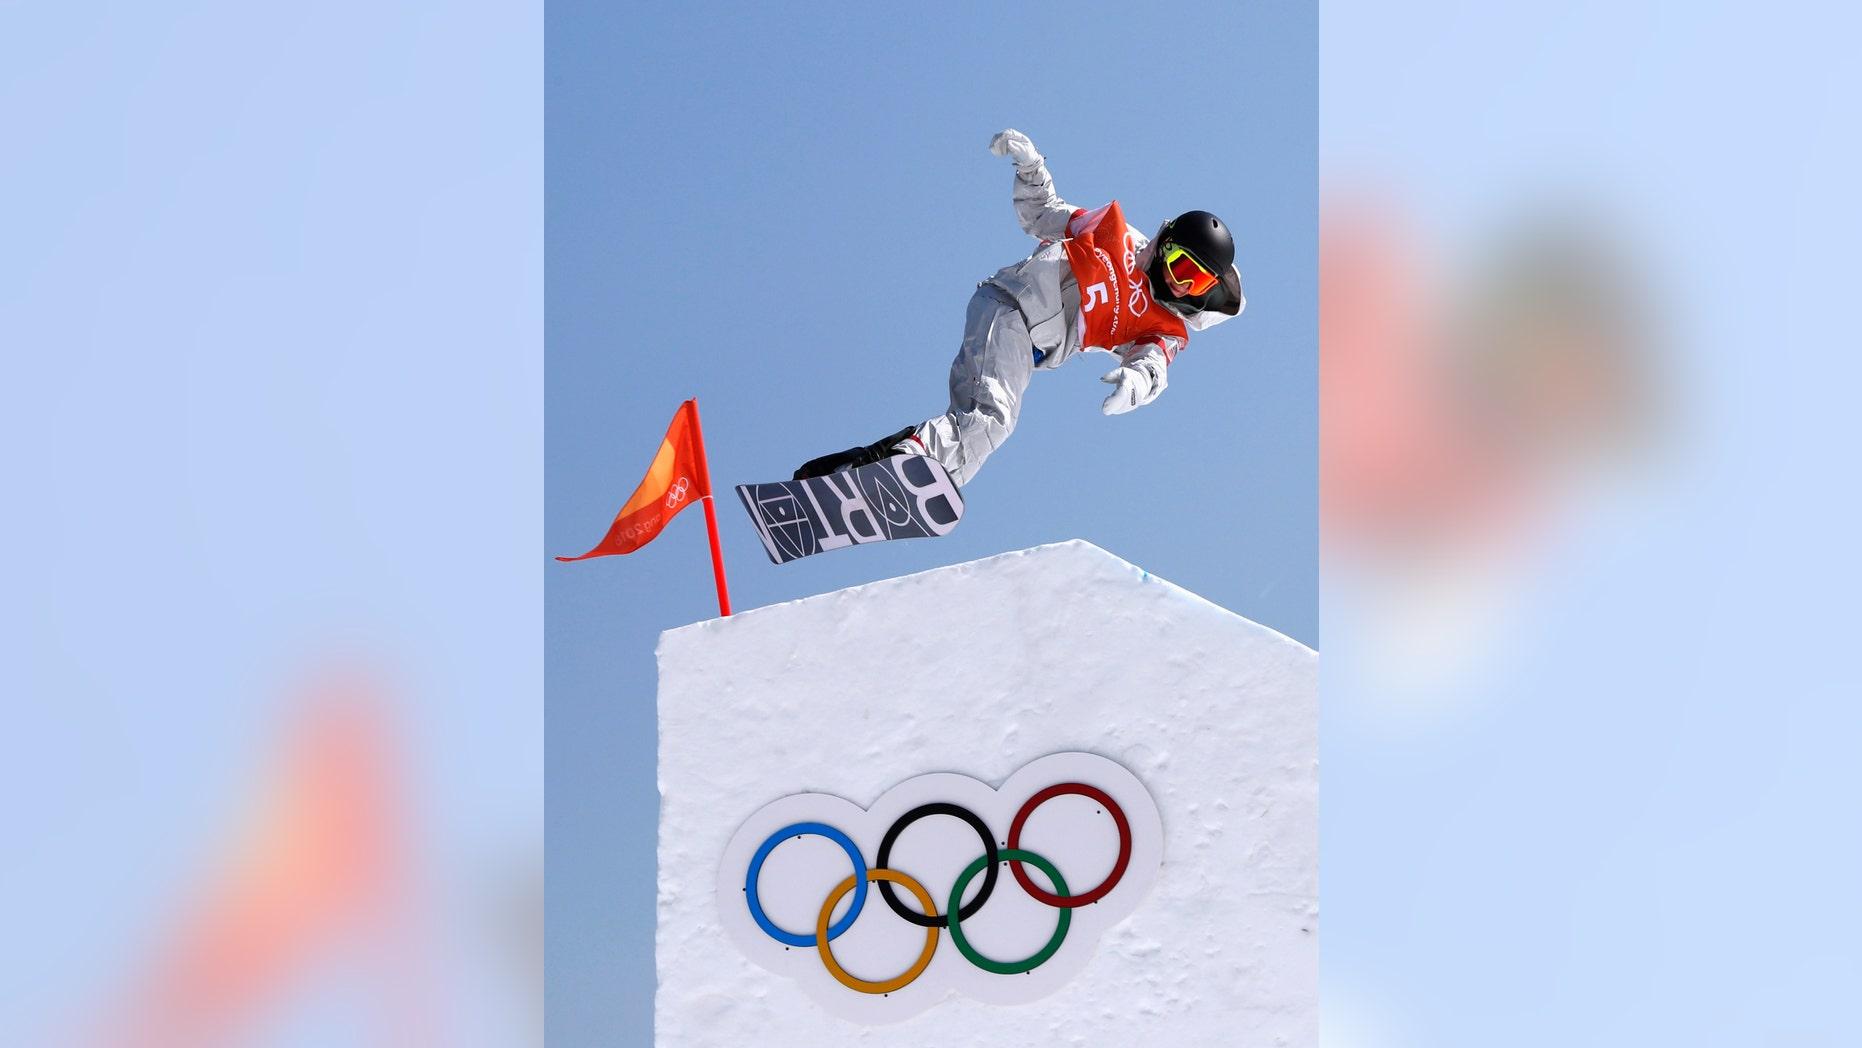 File photo - Snowboarding - Pyeongchang 2018 Winter Olympics February 8, 2018 - An unidentified athlete trains. (REUTERS/Issei Kato)